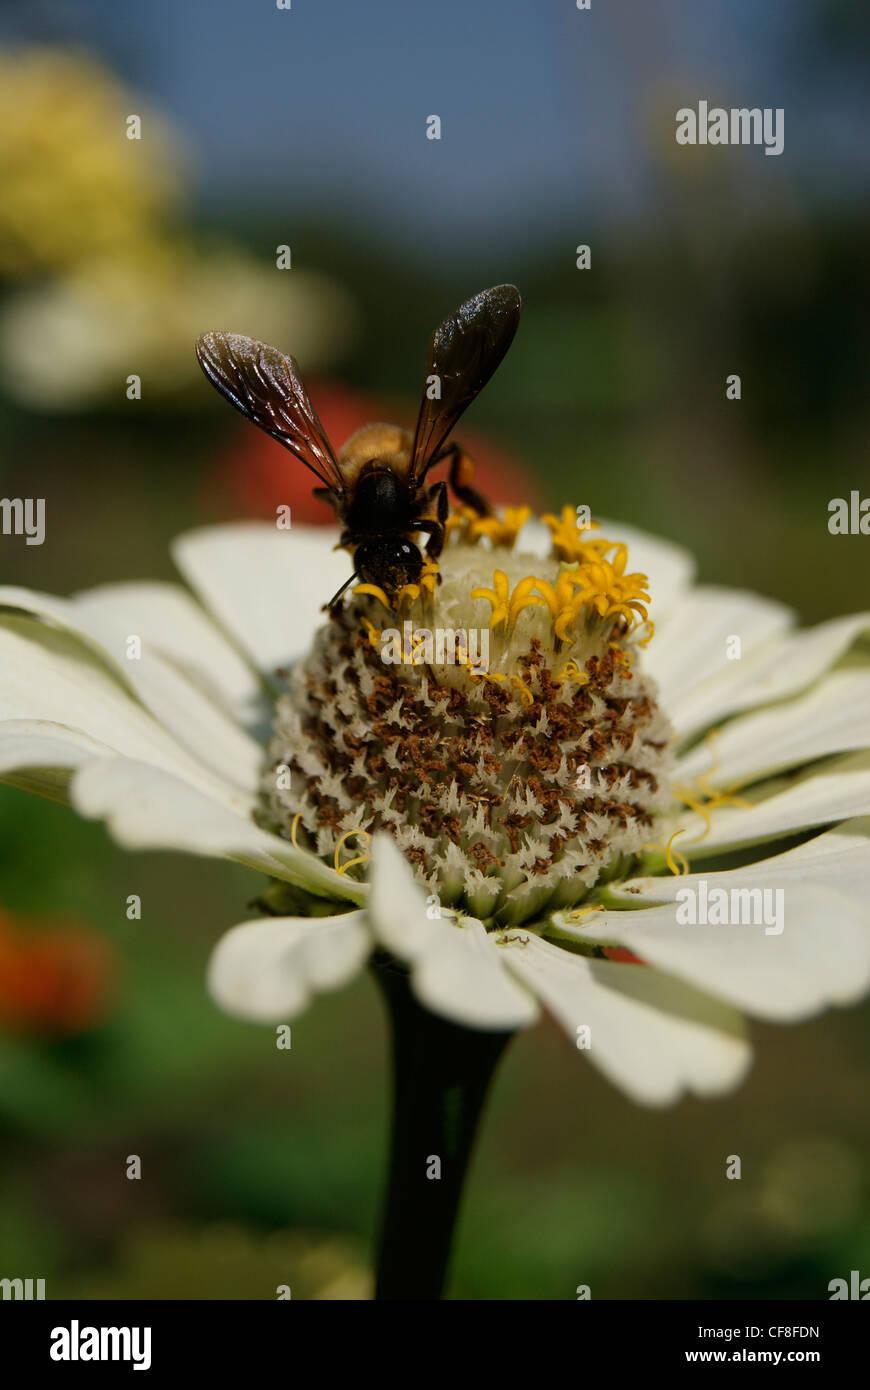 Honeybee sucking Honey from White Dahlia flower.A Lake Shore Garden flower closeup scene from Kerala,India - Stock Image